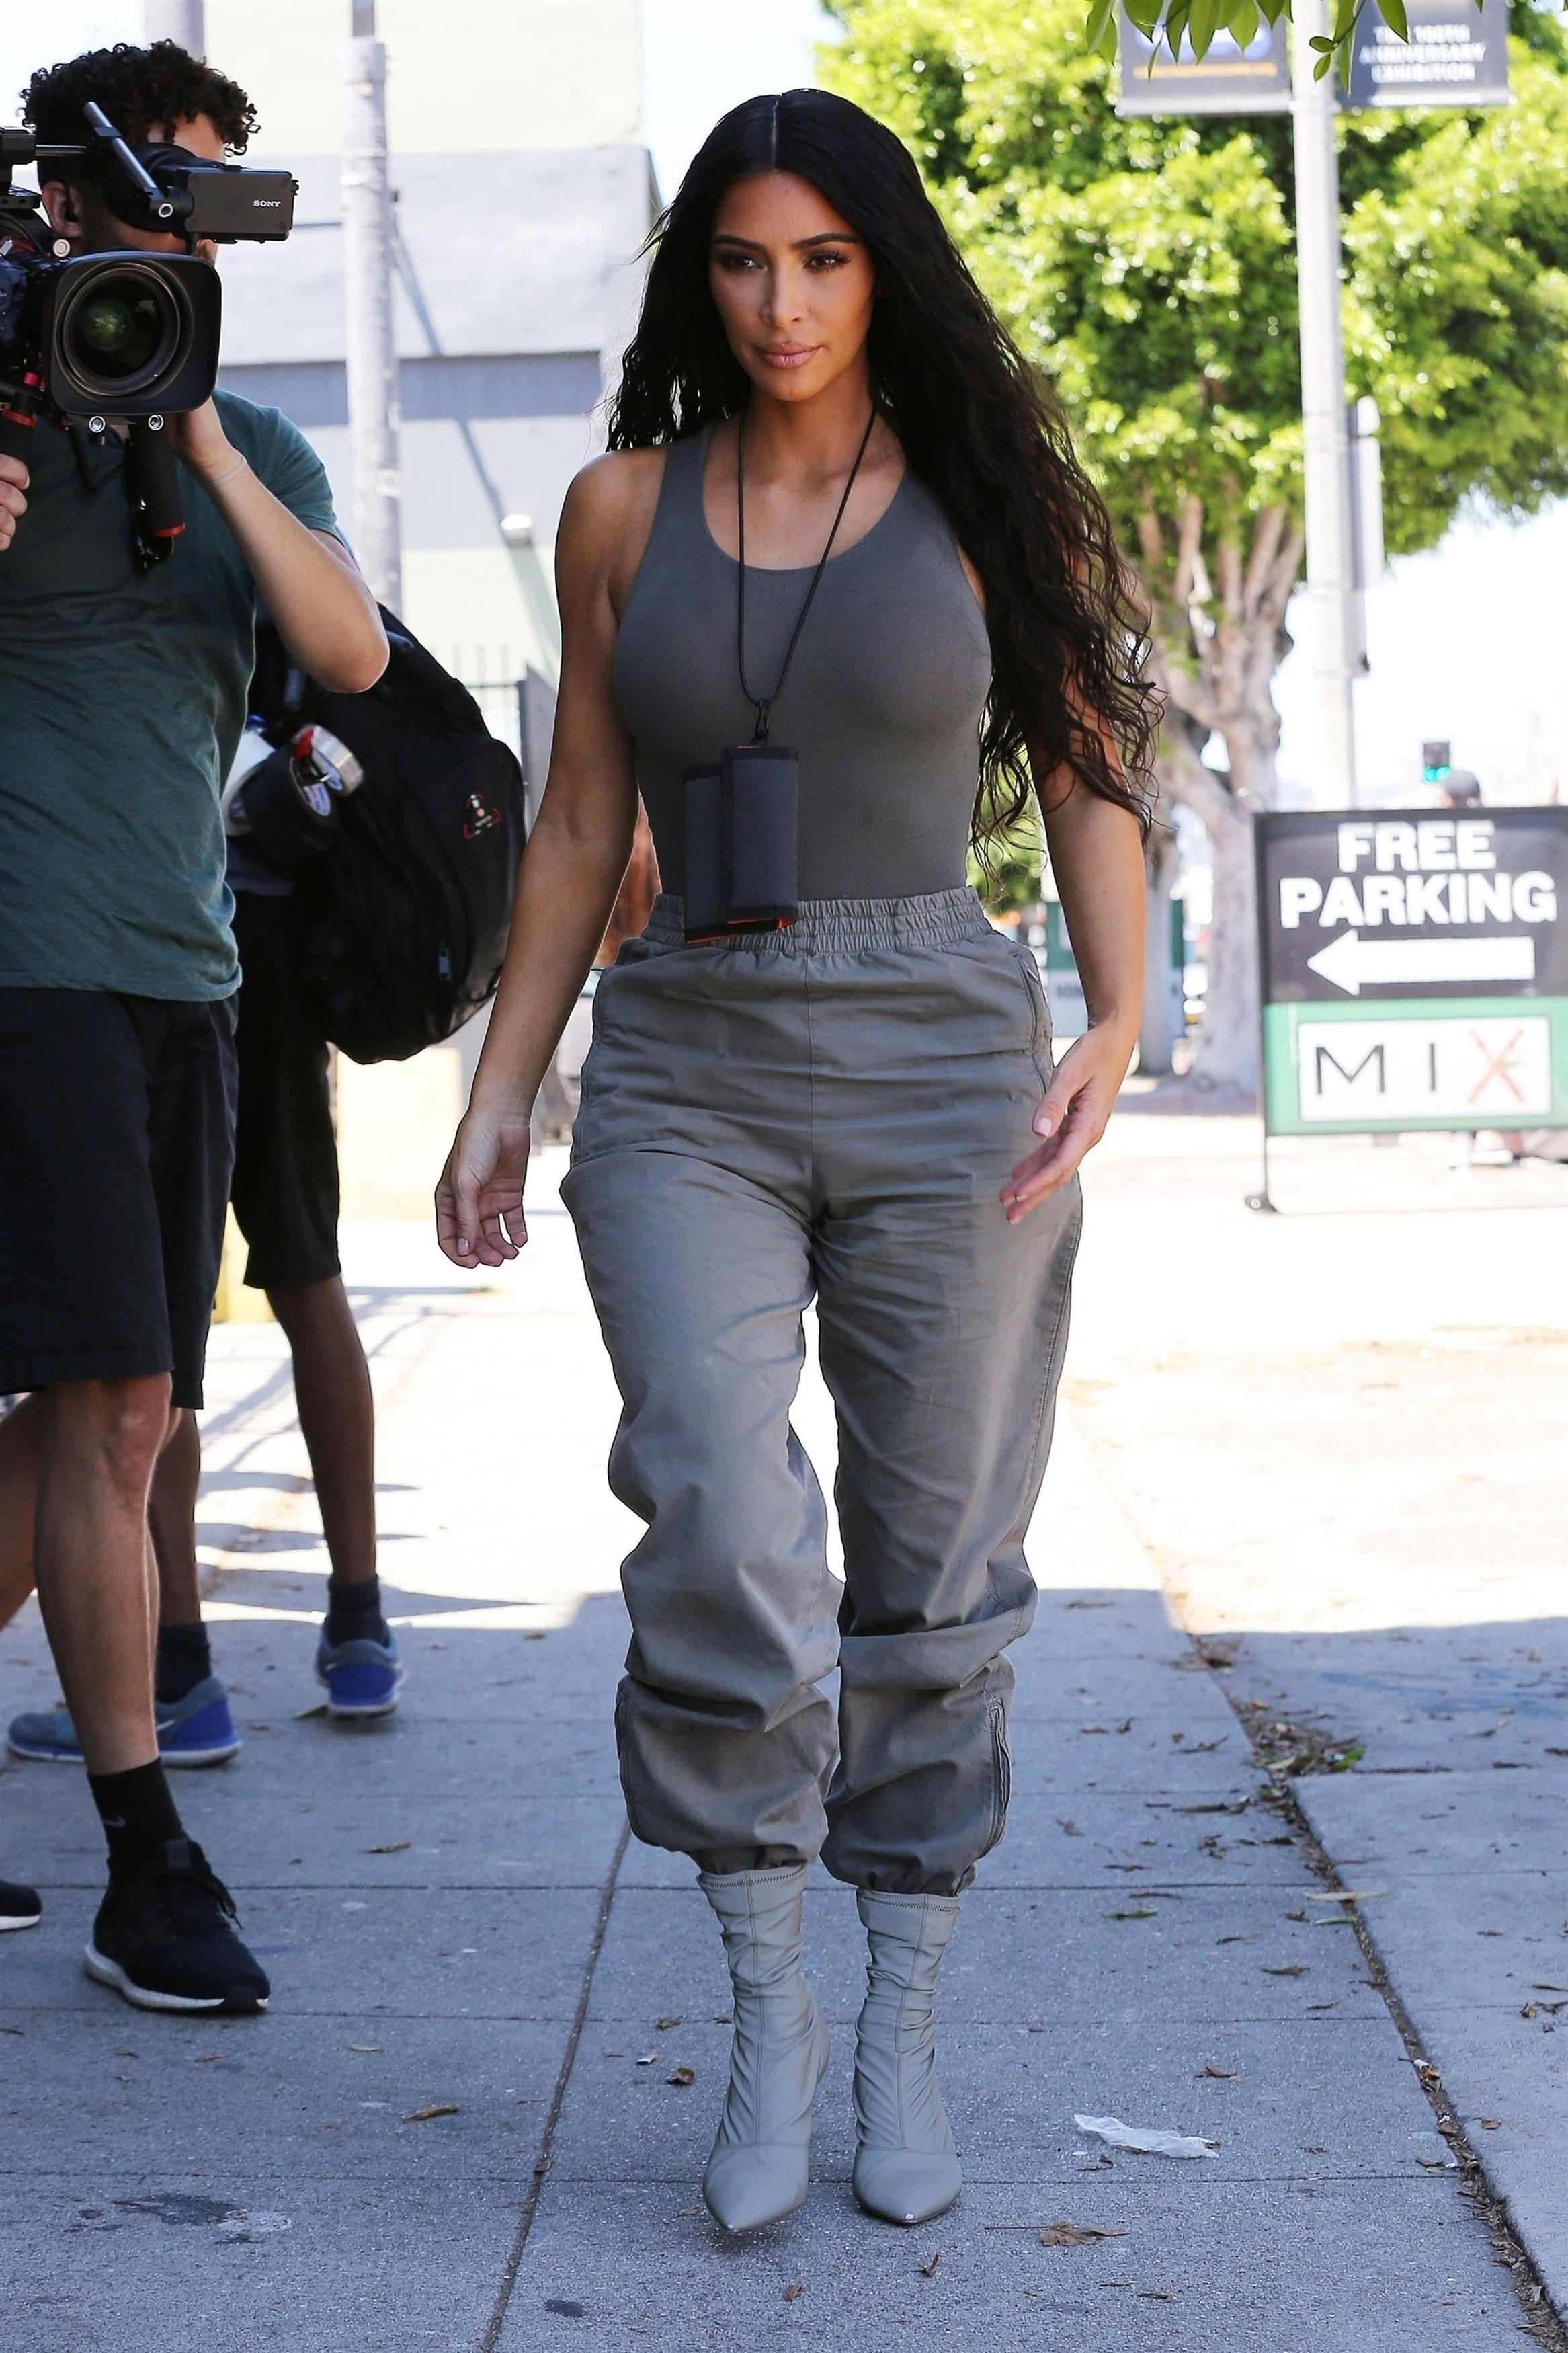 Latest Kim Kardashian Candid Pictures - Sexy Actress Pictures | Hot Actress Pictures - ActressSnaps.com